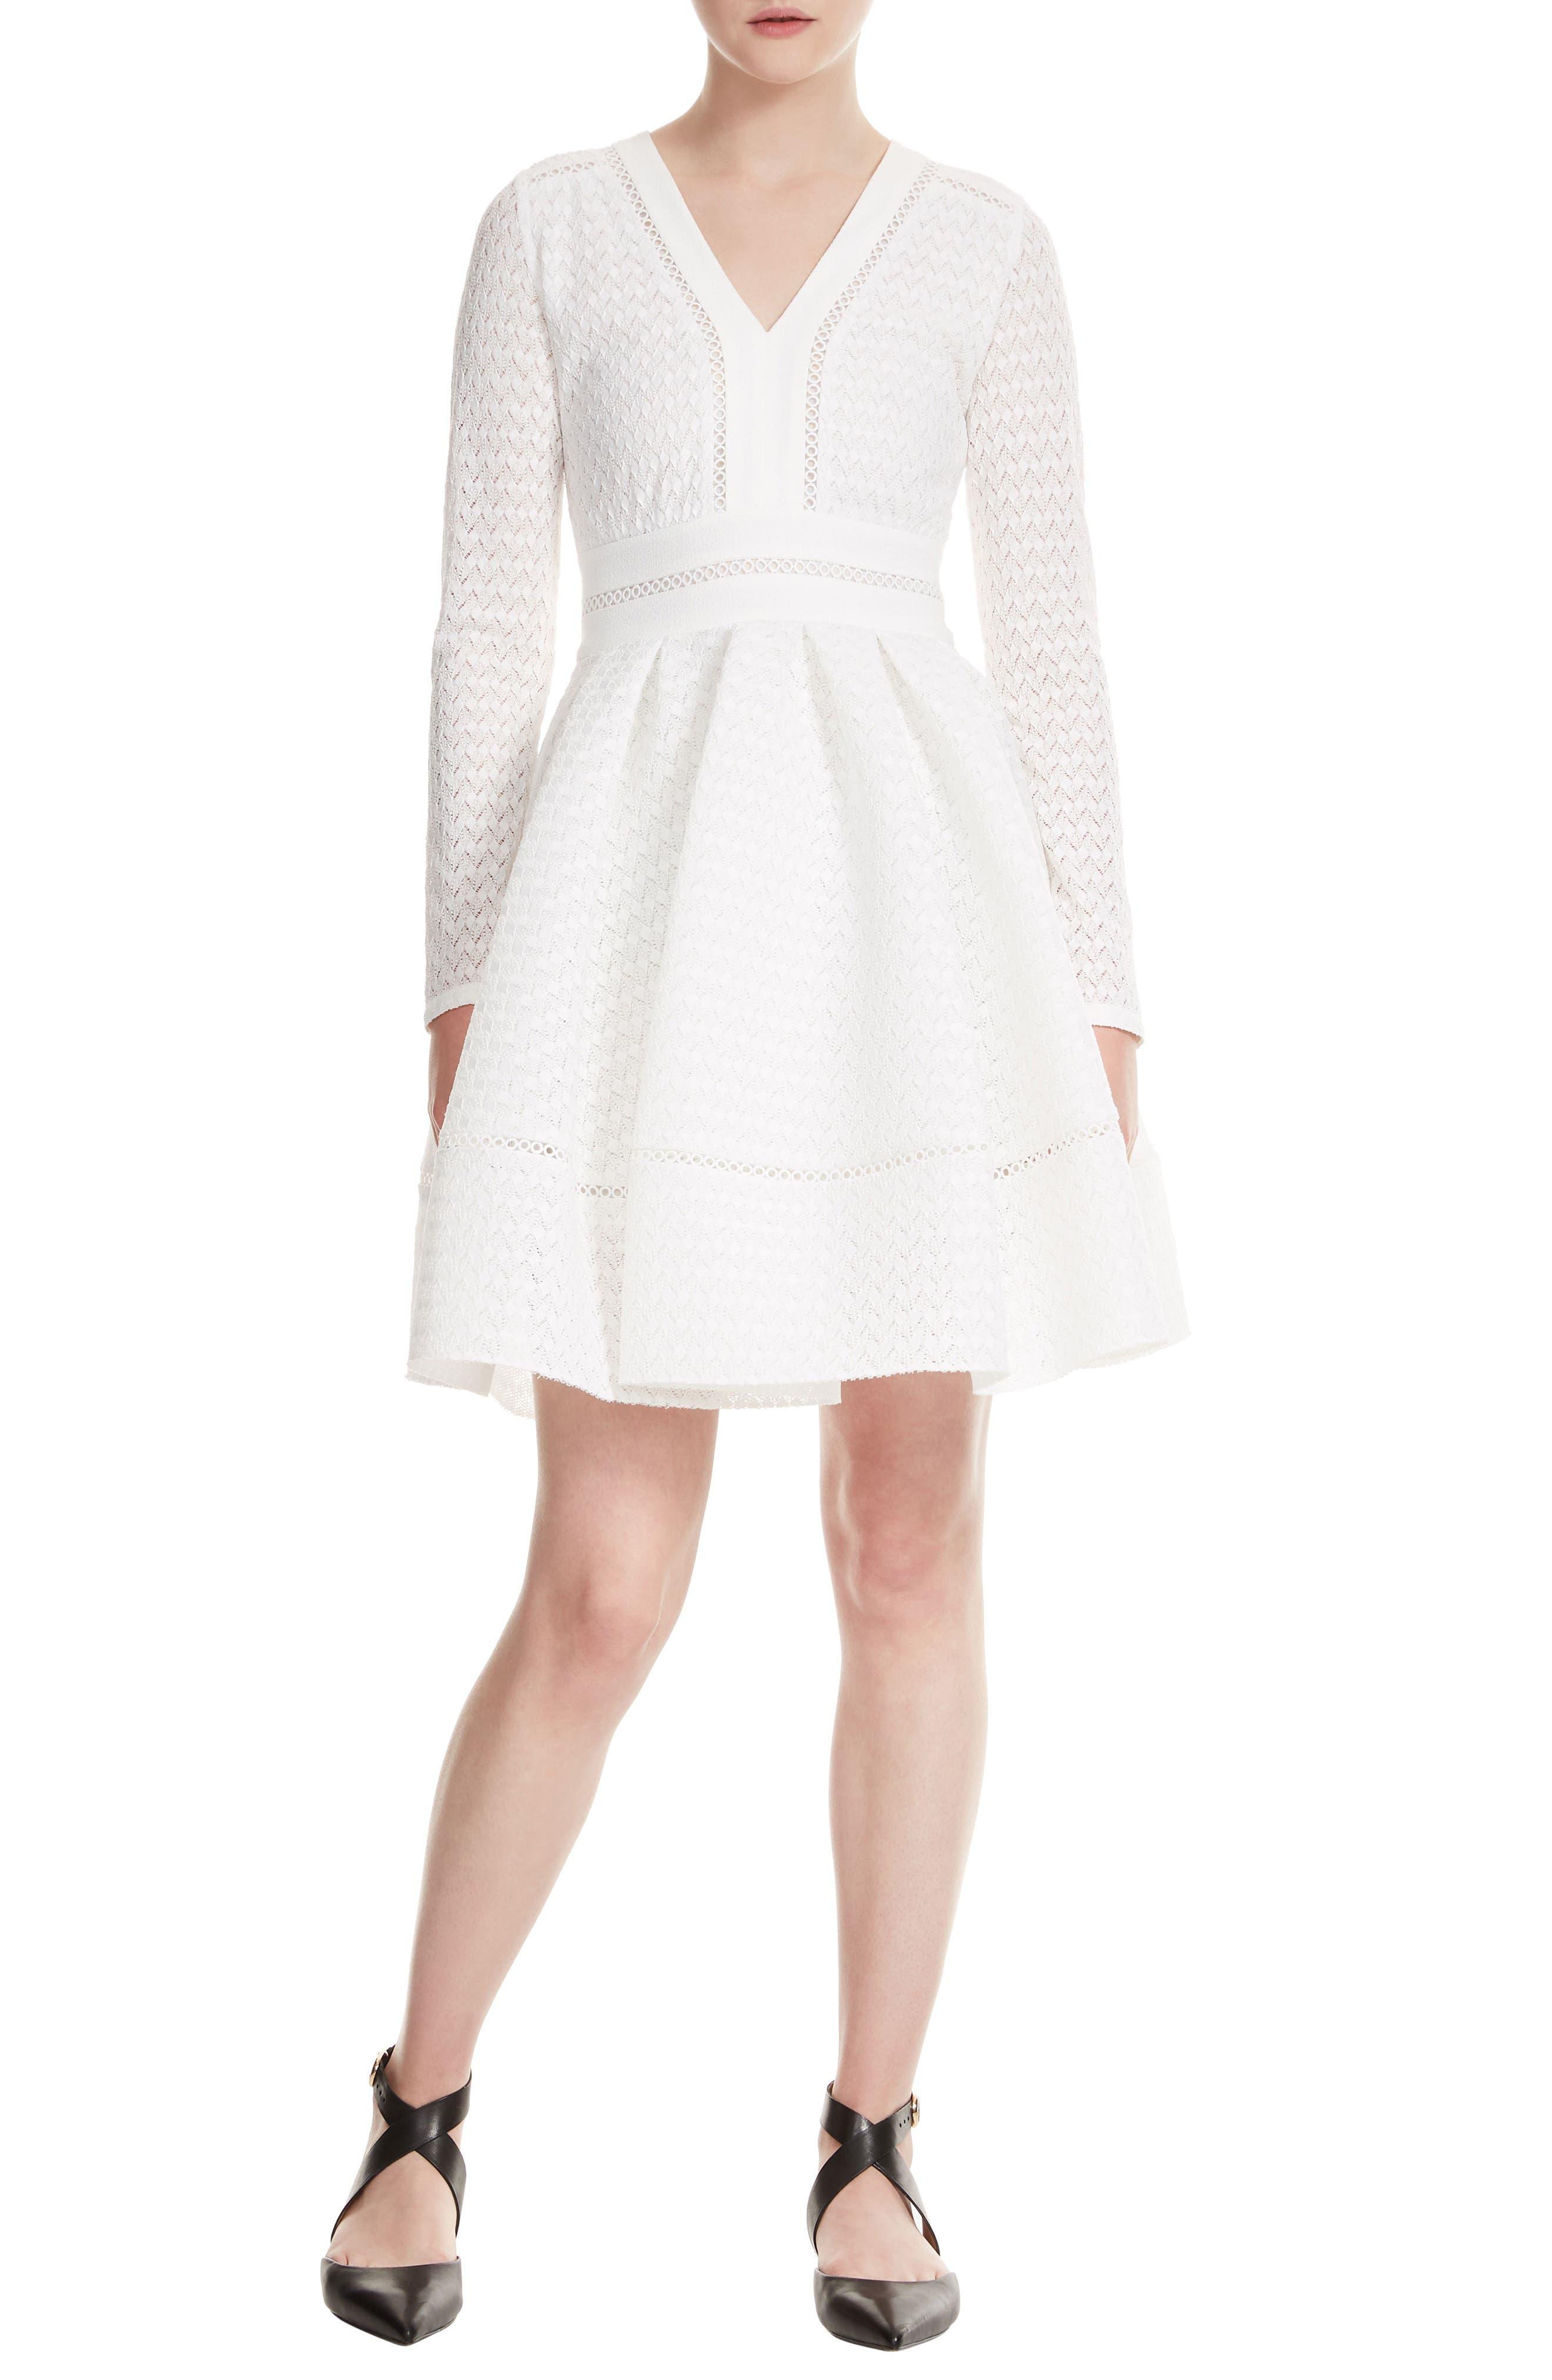 Pointelle Fit & Flare Dress,                             Main thumbnail 1, color,                             100